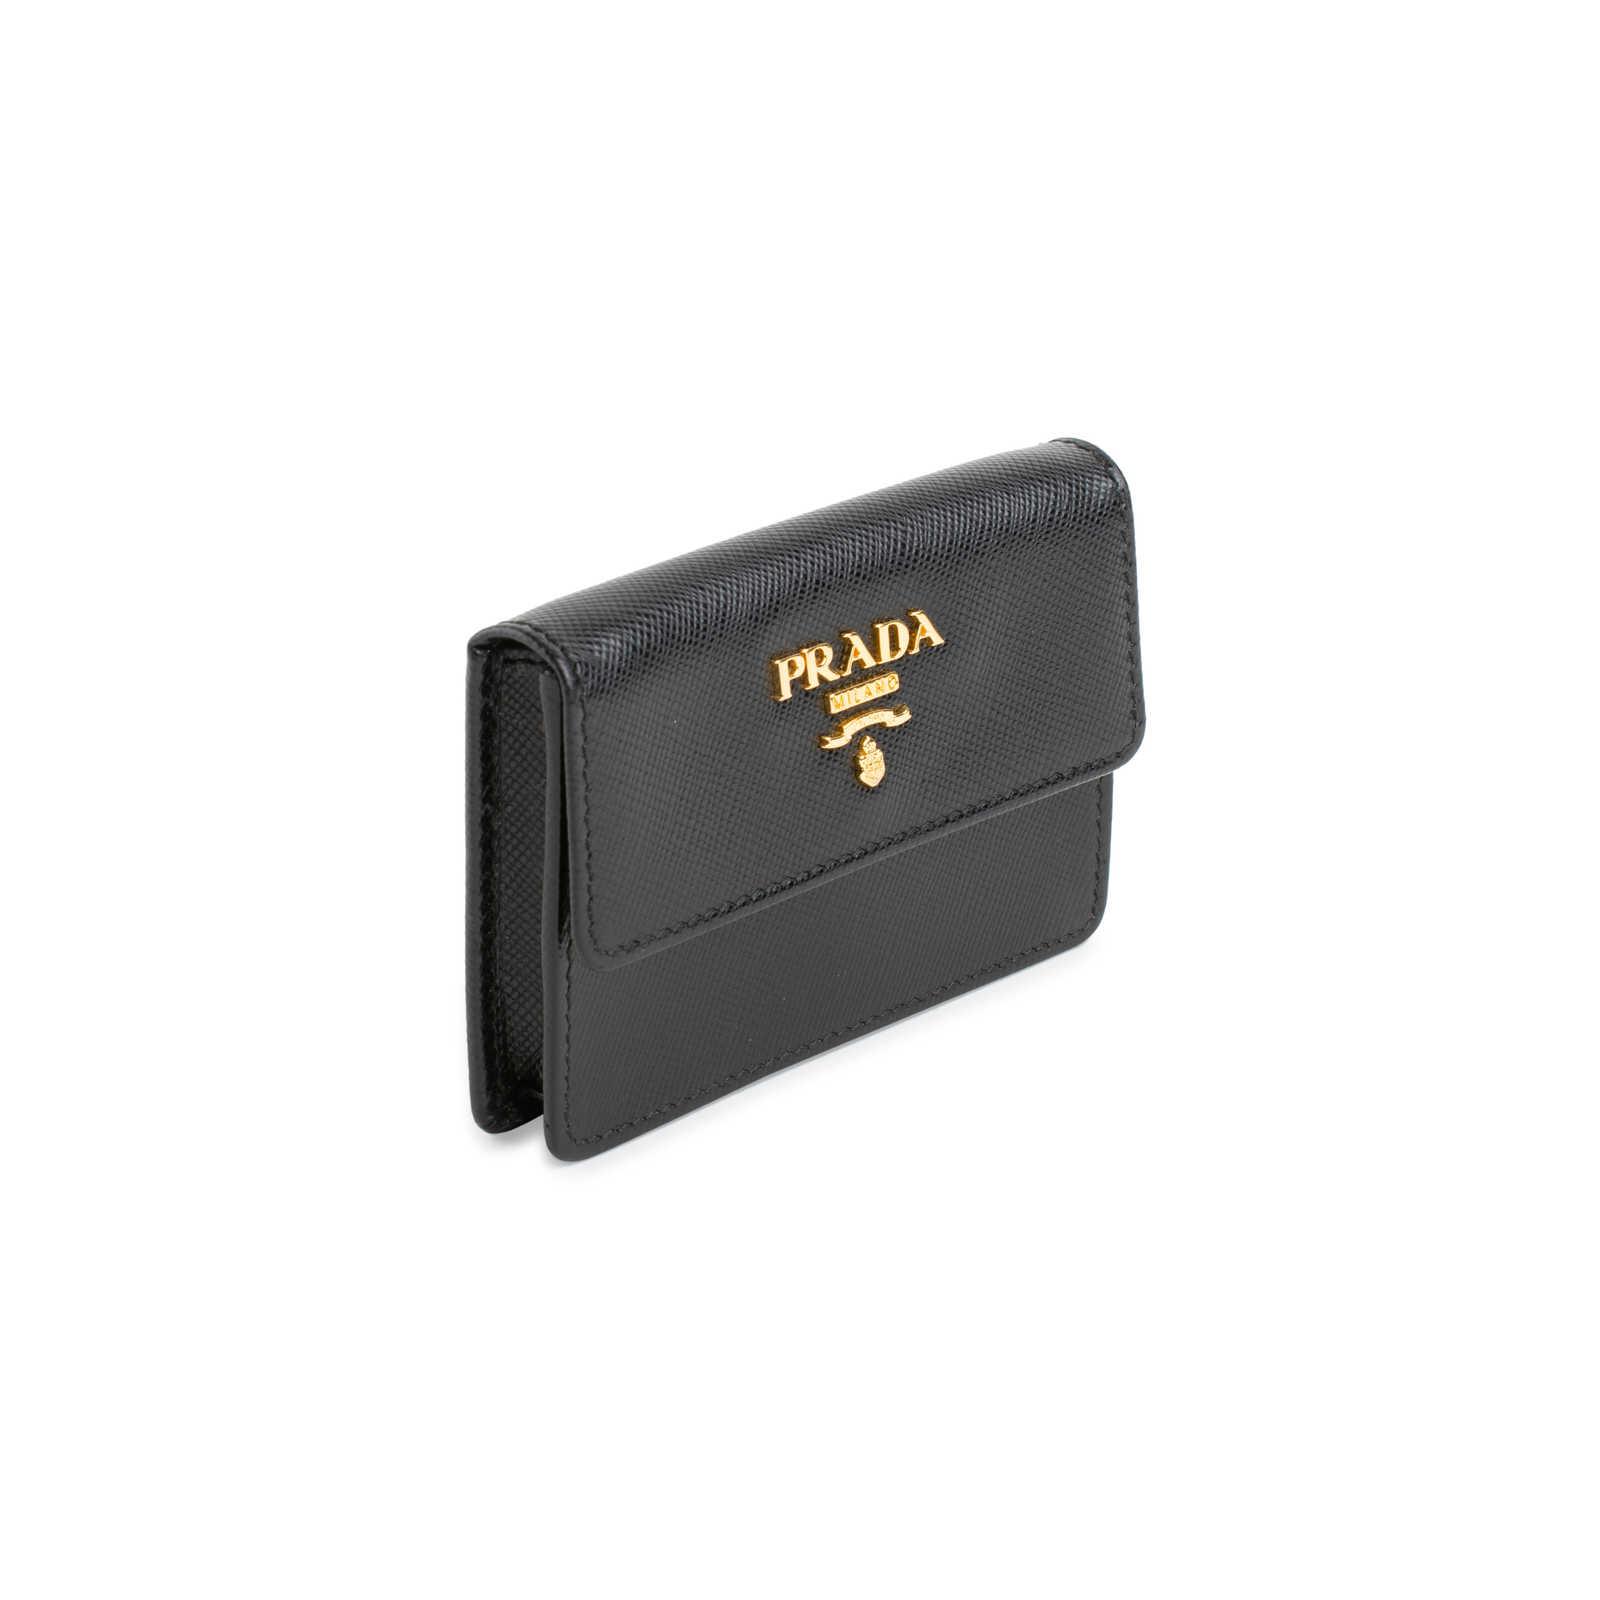 35d1ce075cc9 ... Authentic Second Hand Prada Saffiano Card Holder (PSS-556-00031) -  Thumbnail ...